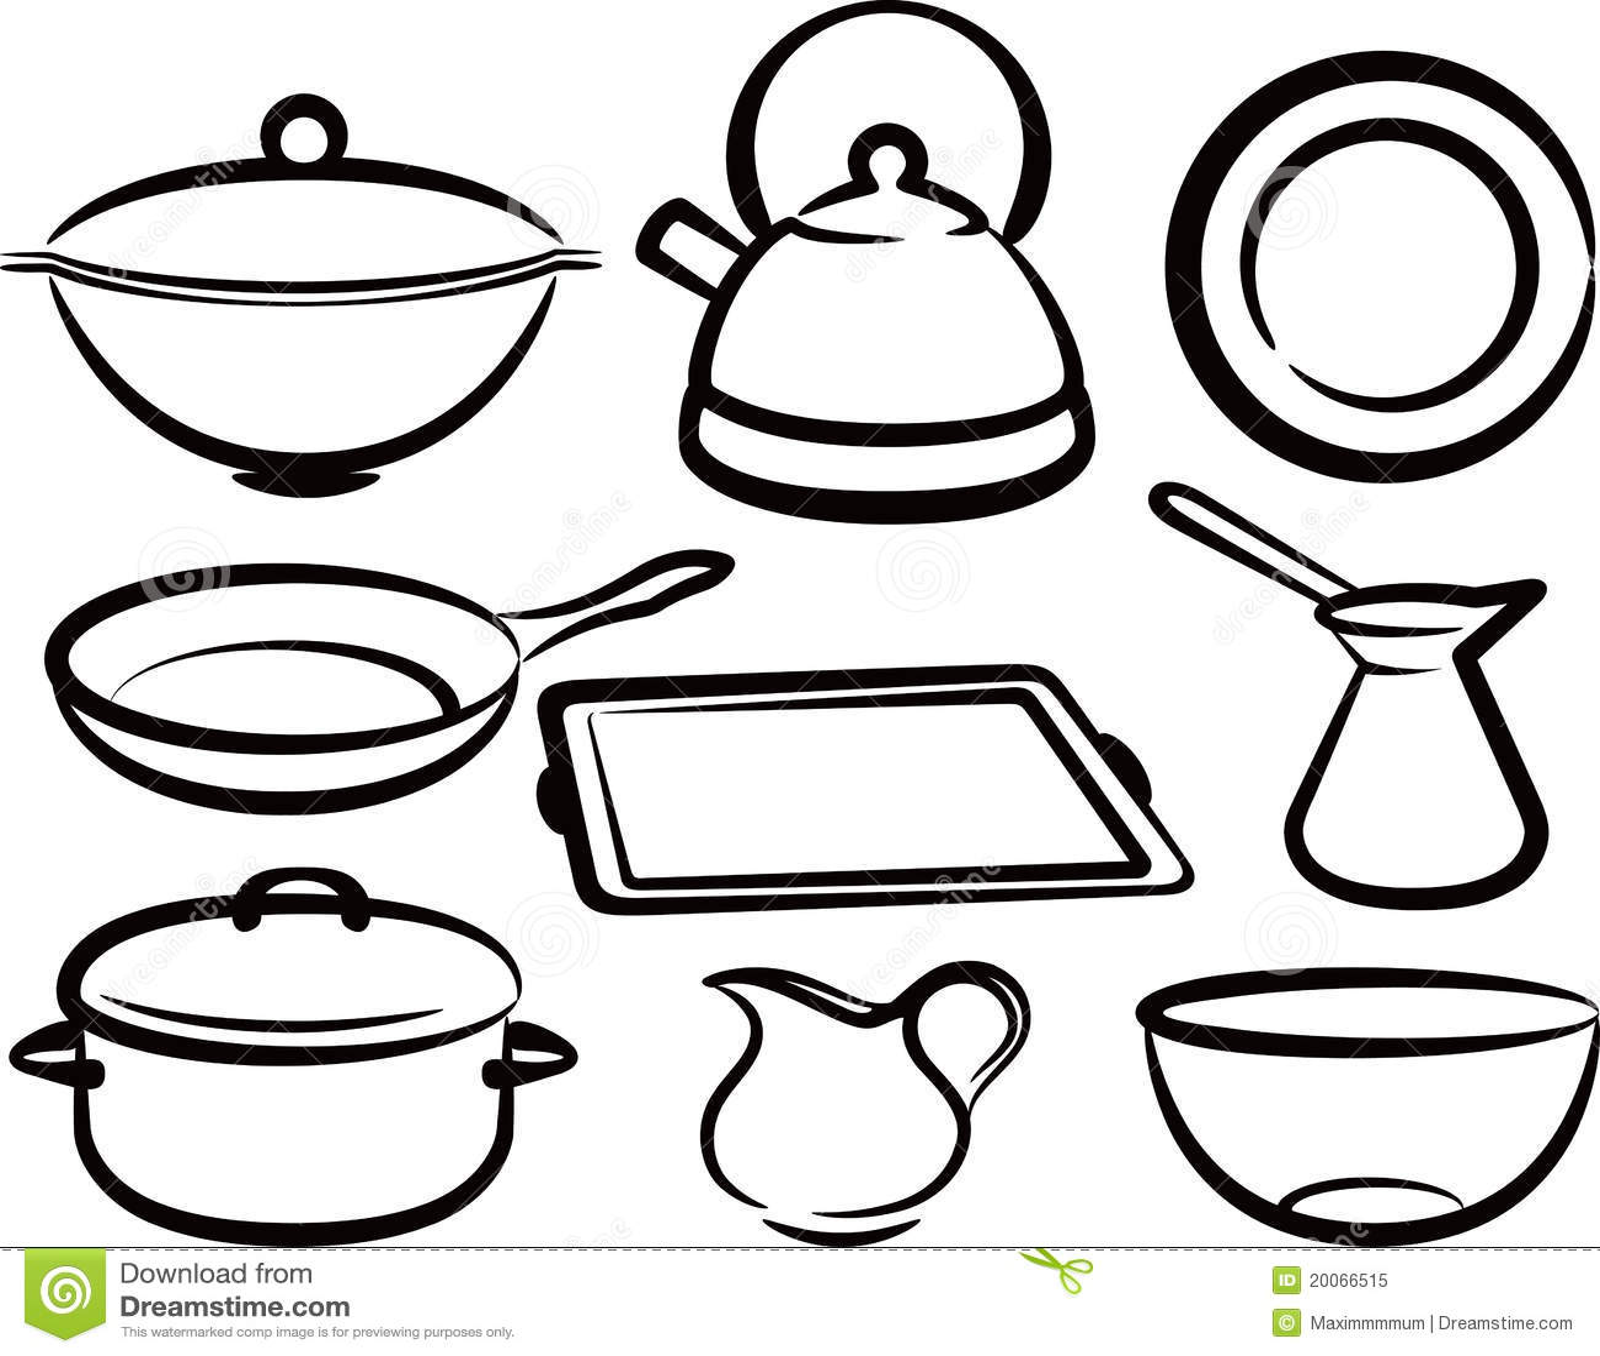 Disegni Cucina. Perfect Disegni Decalcabili Motivi Per Cucina With ...